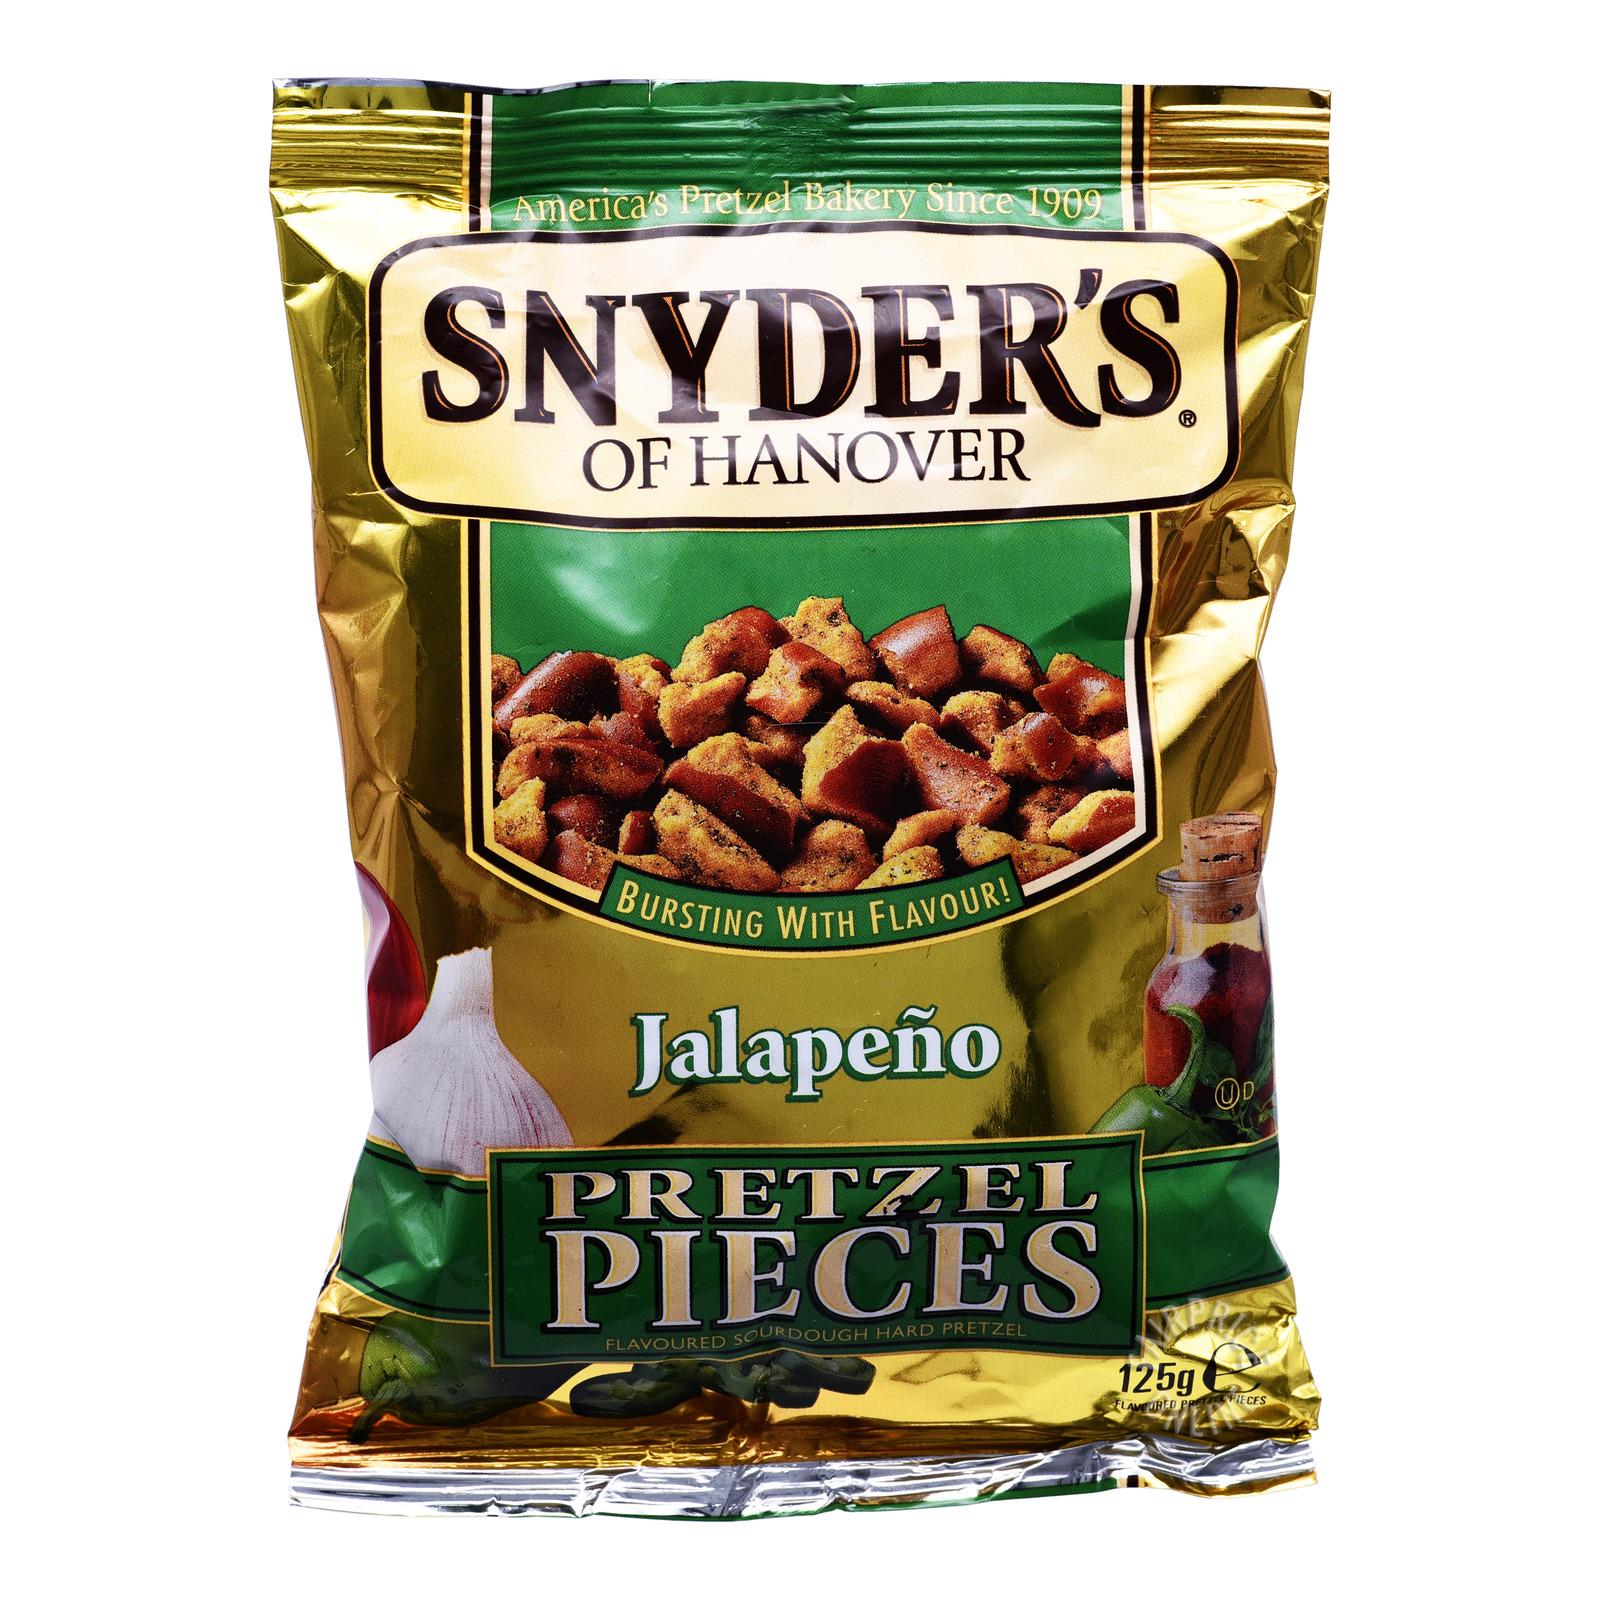 Snyder's of Hanover Pretzel Pieces - Jalapeno